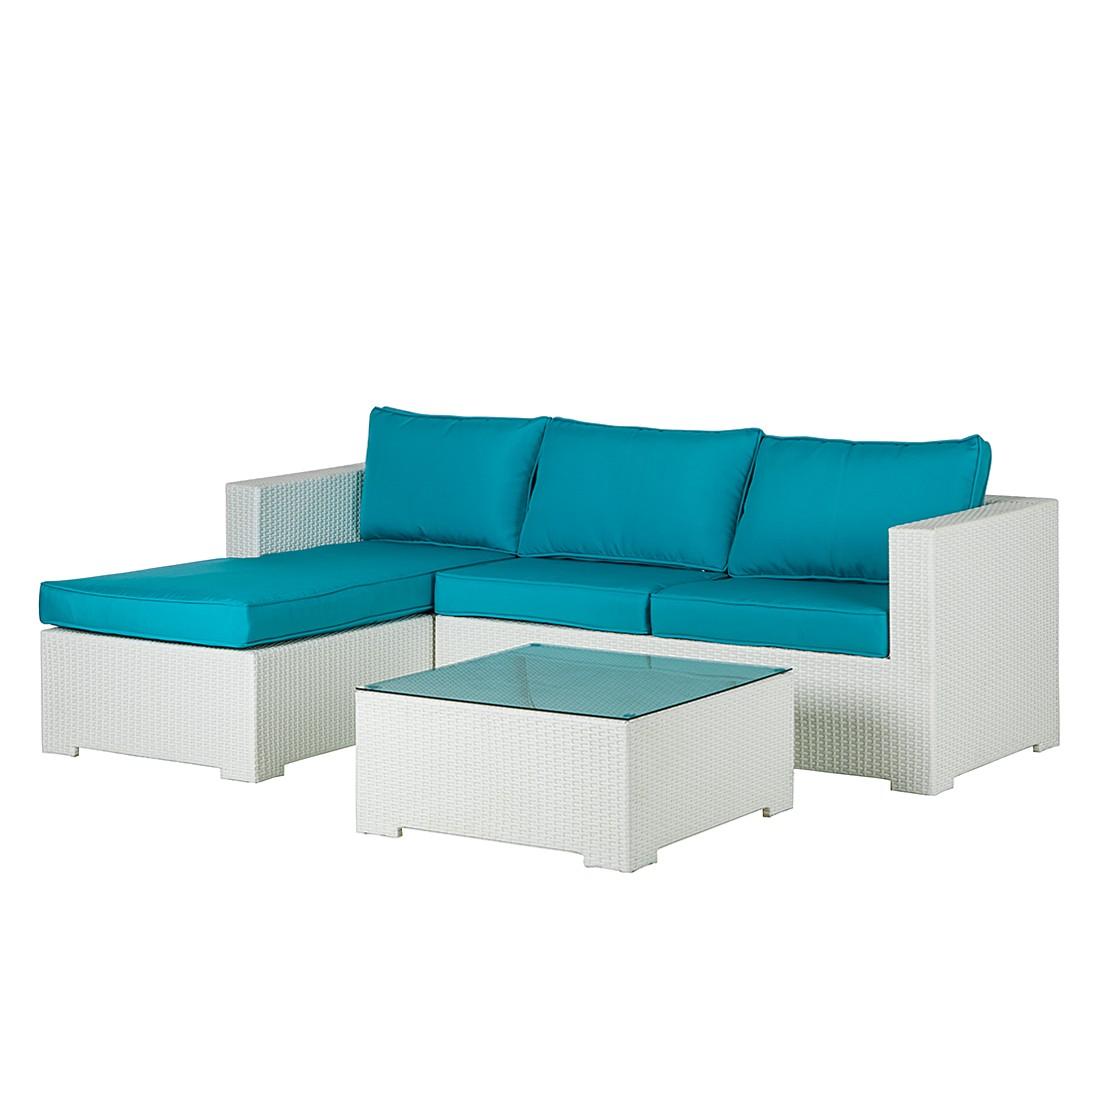 Lounge Sitzgruppe Paradise Lounge 3 Teilig Polyrattan Textil